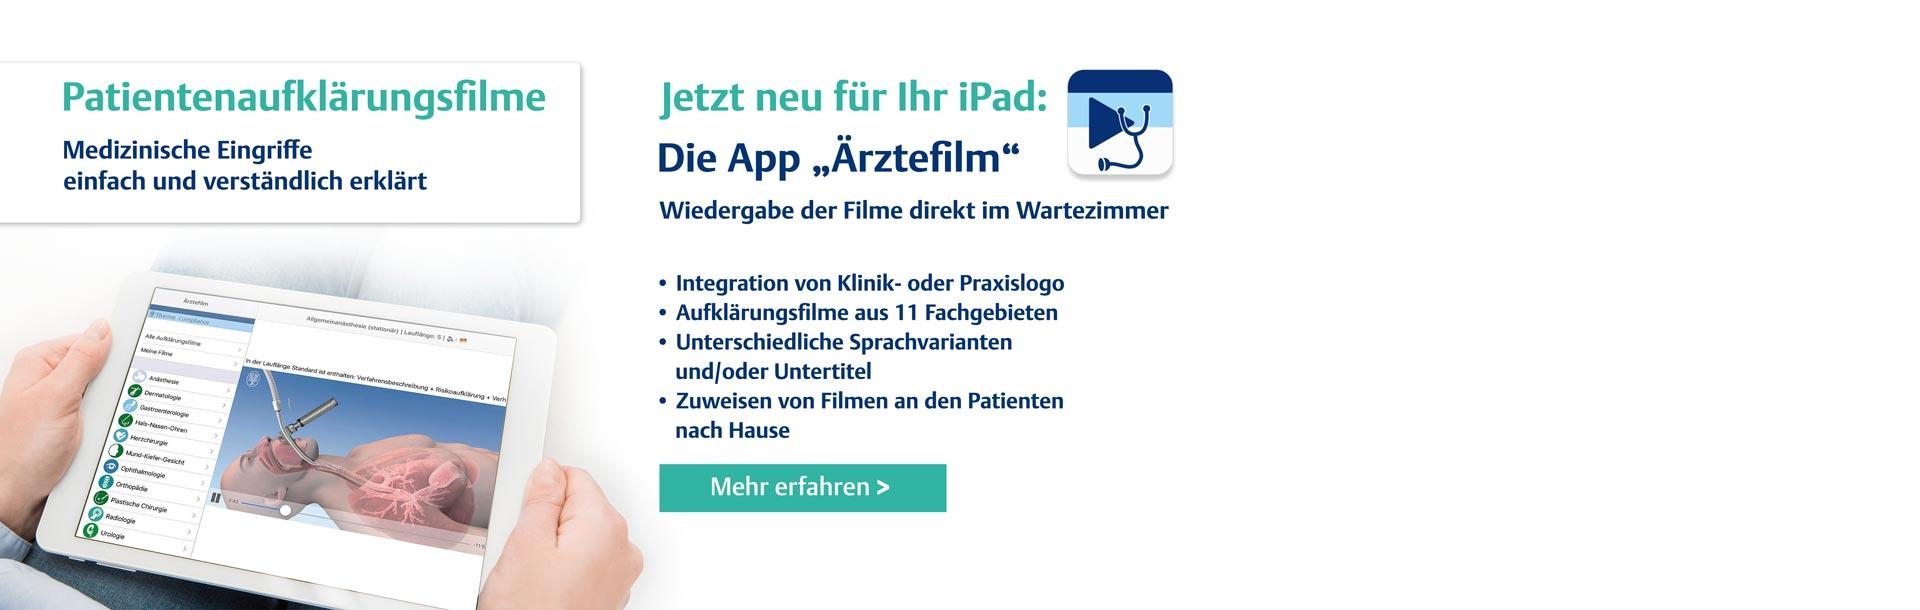 Slider Aufklärungsfilme Video-App Ärztefilm